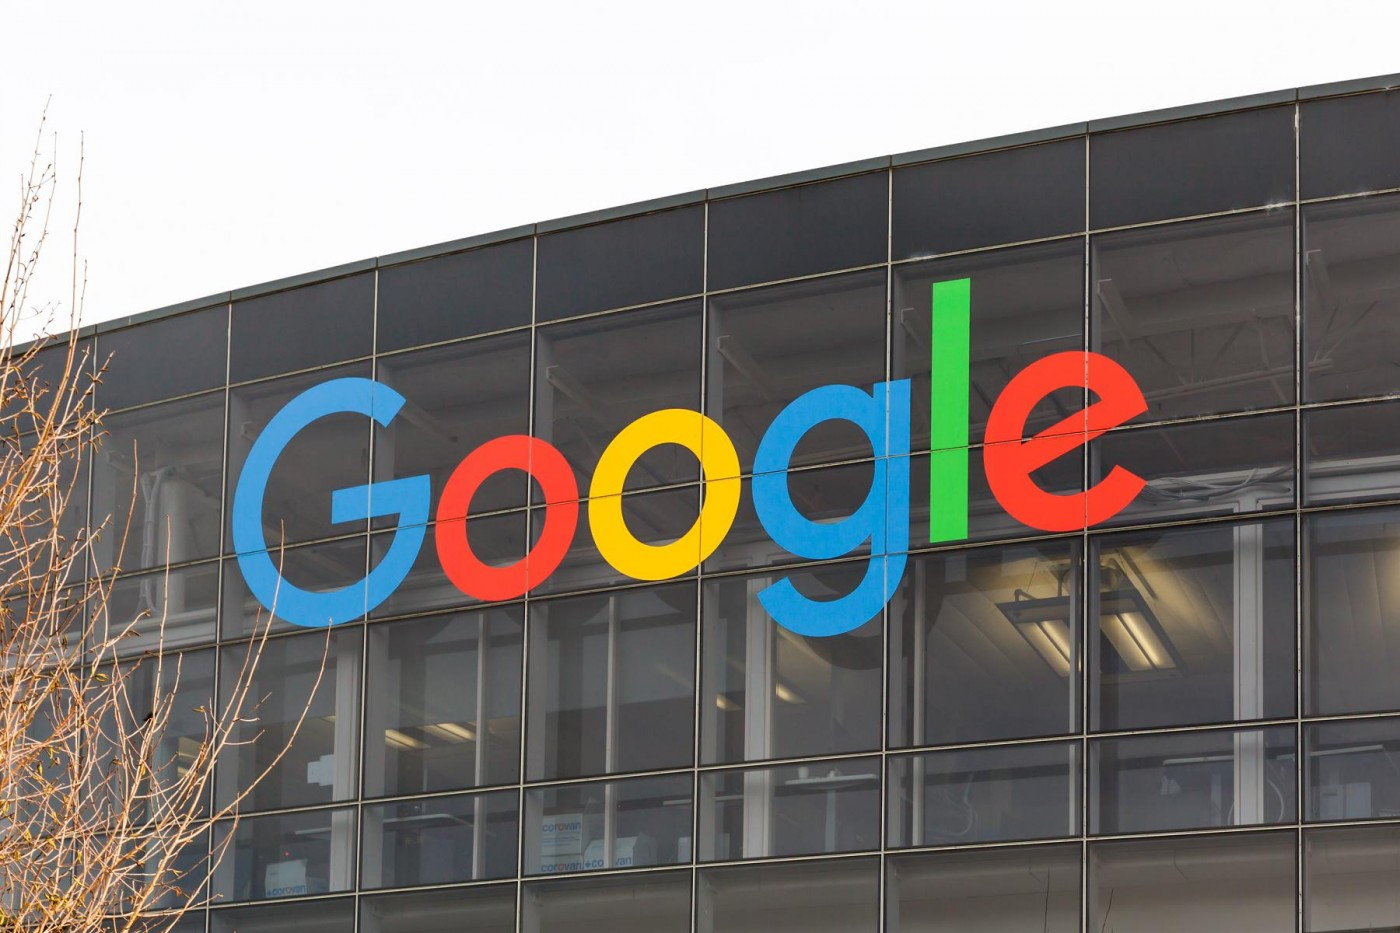 Alphabet廣告營收成長放緩,Google Cloud會是下一個成長火車頭嗎?